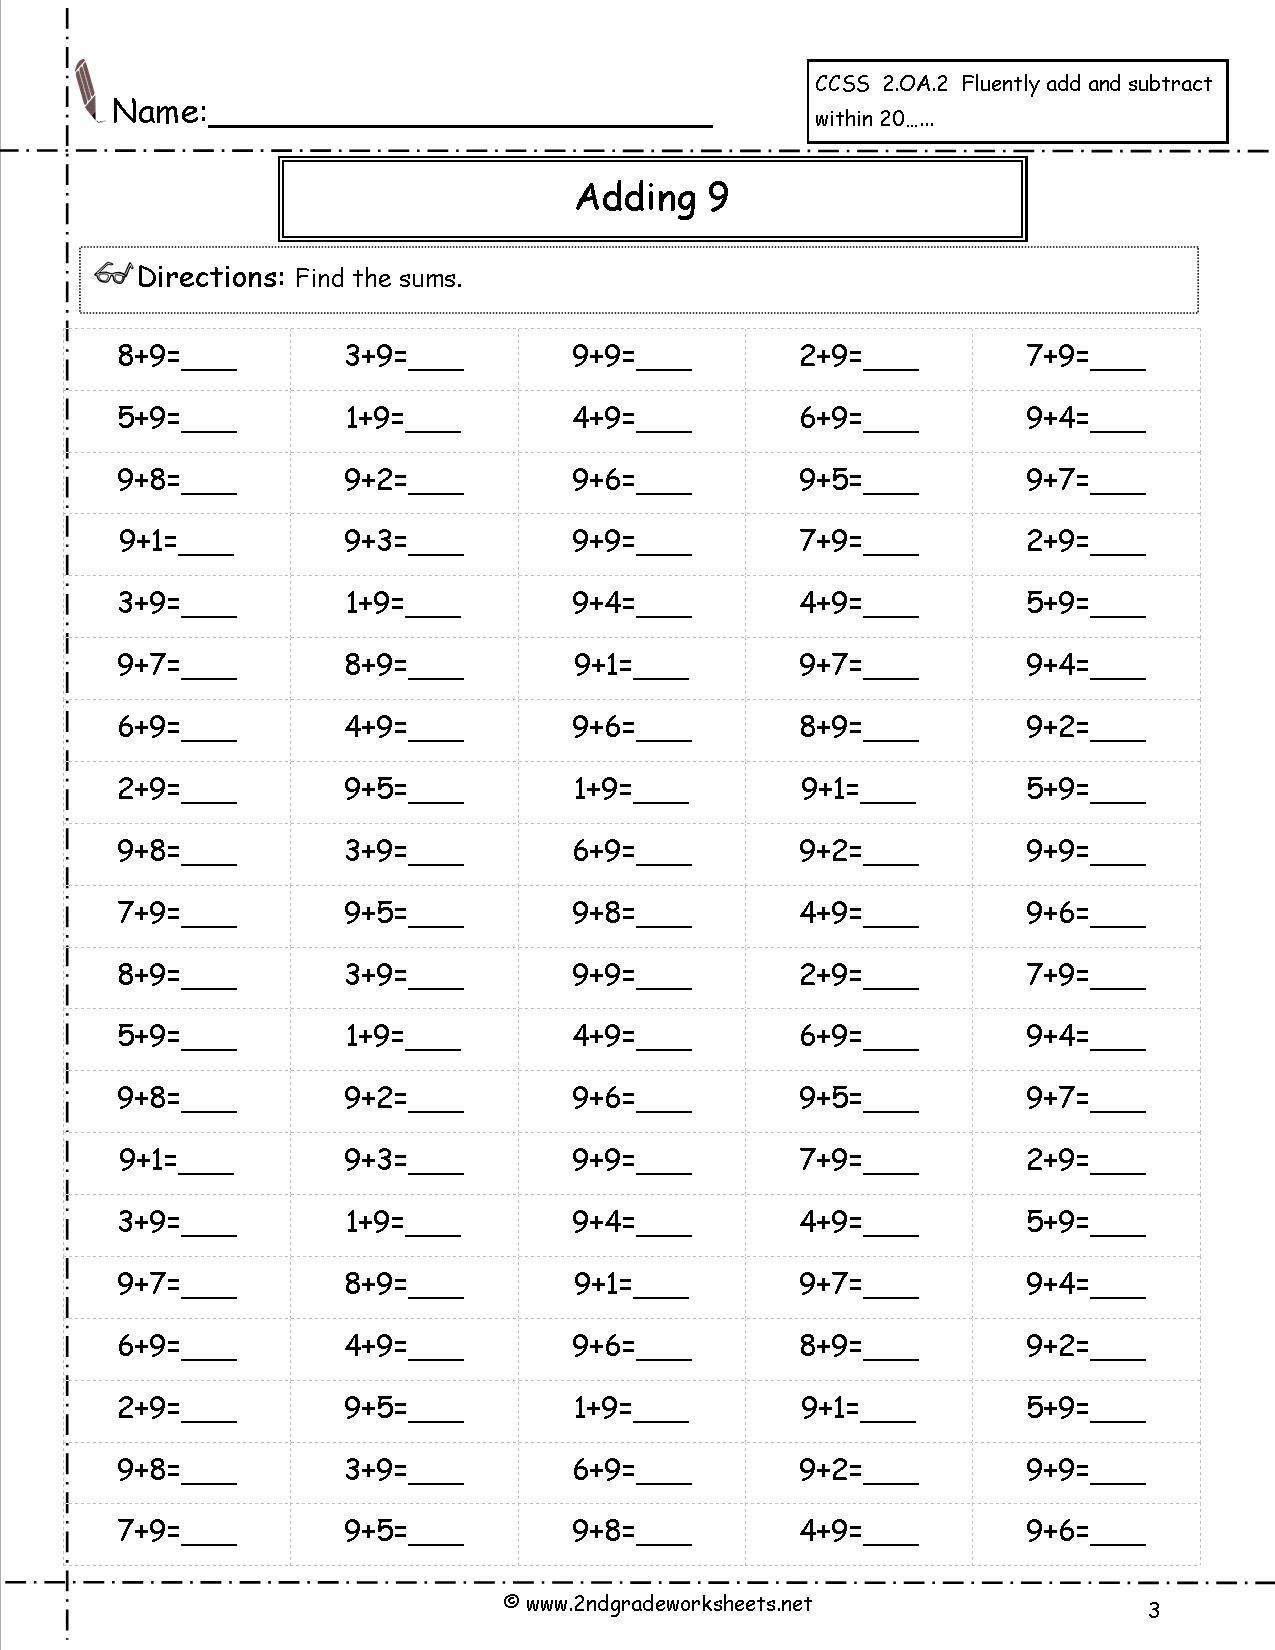 hight resolution of Adding 9 worksheet   1st grade math